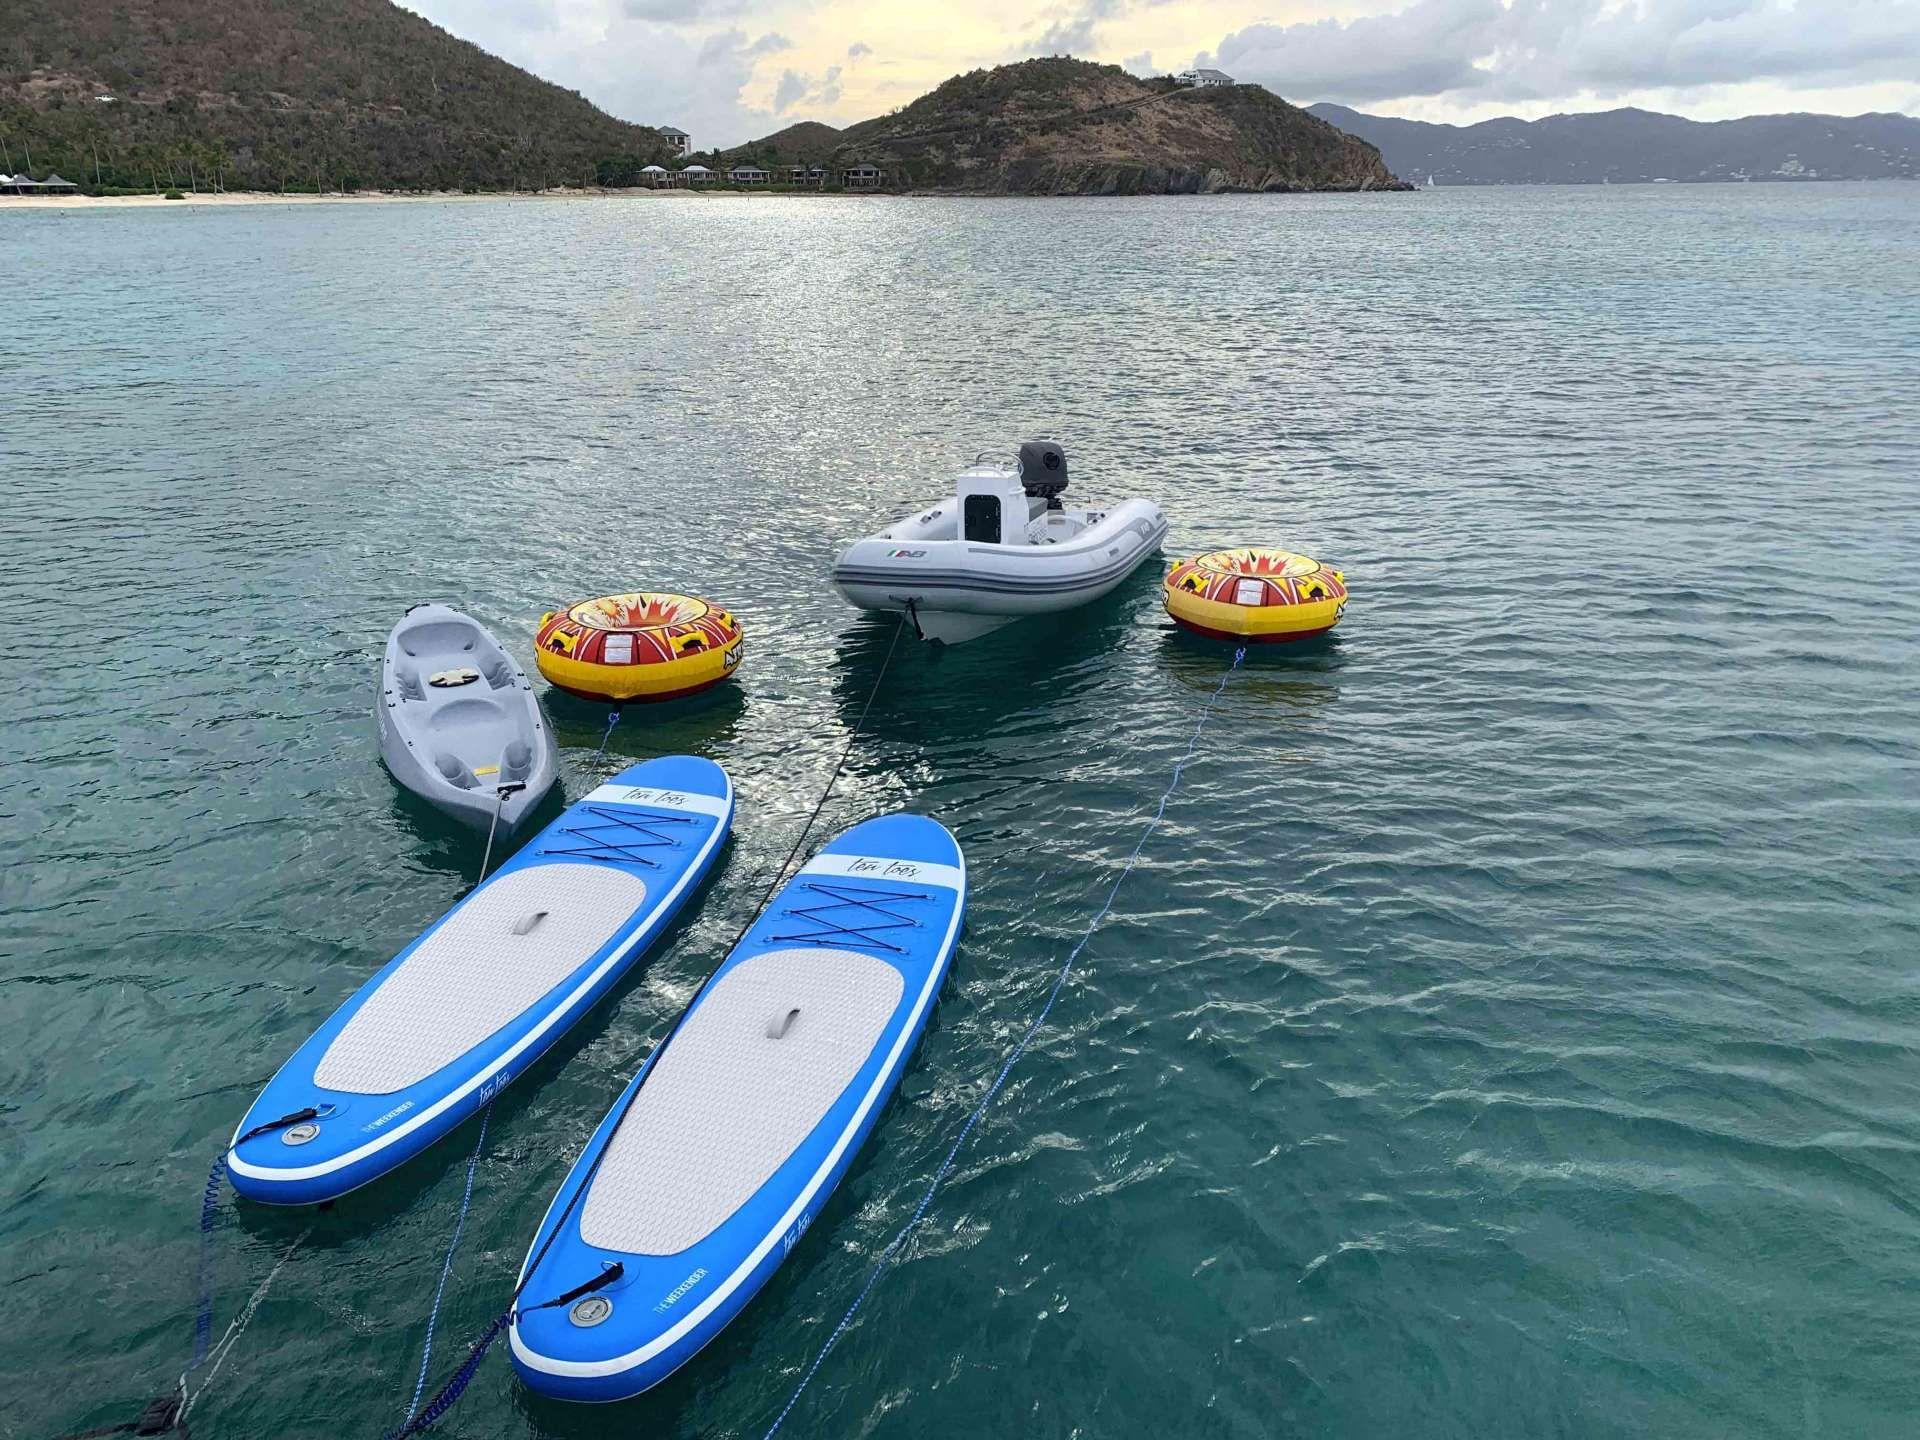 GYPSY PRINCES Lagoon 450 Water Sports